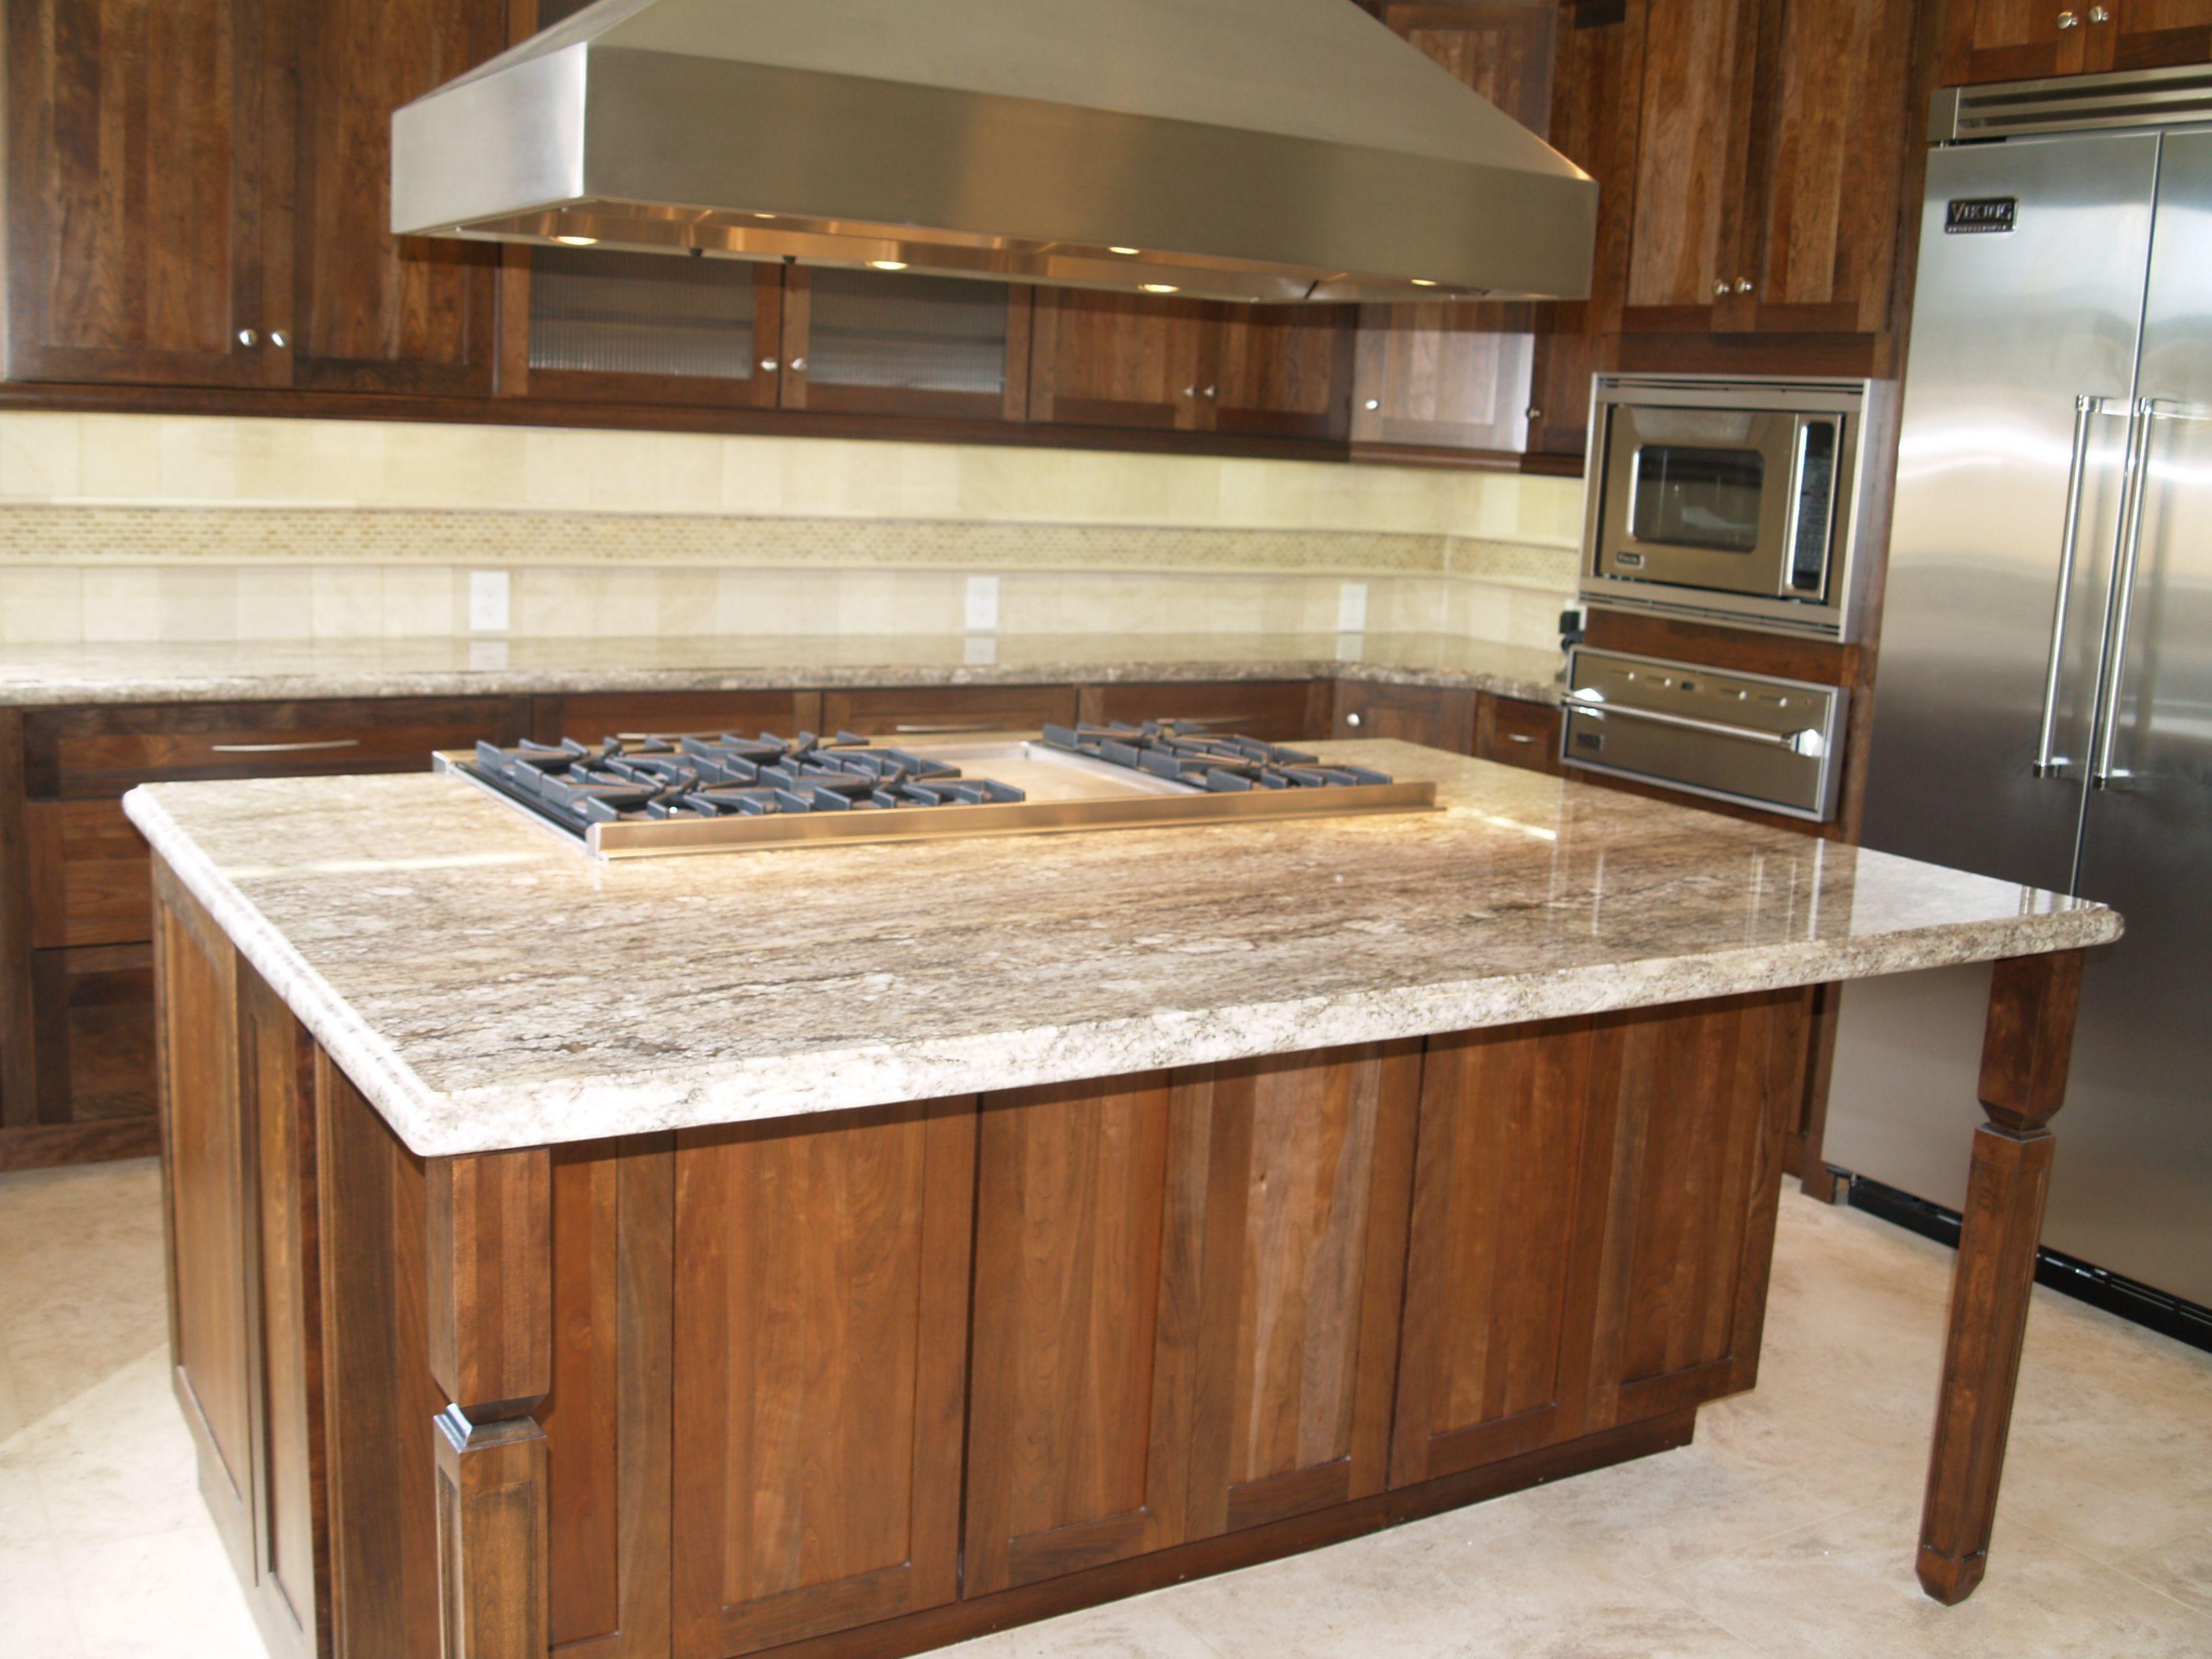 Granit Kuche Insel Kuchen Granitarbeitsplatten Holz Kucheninsel Grosse Kucheninsel